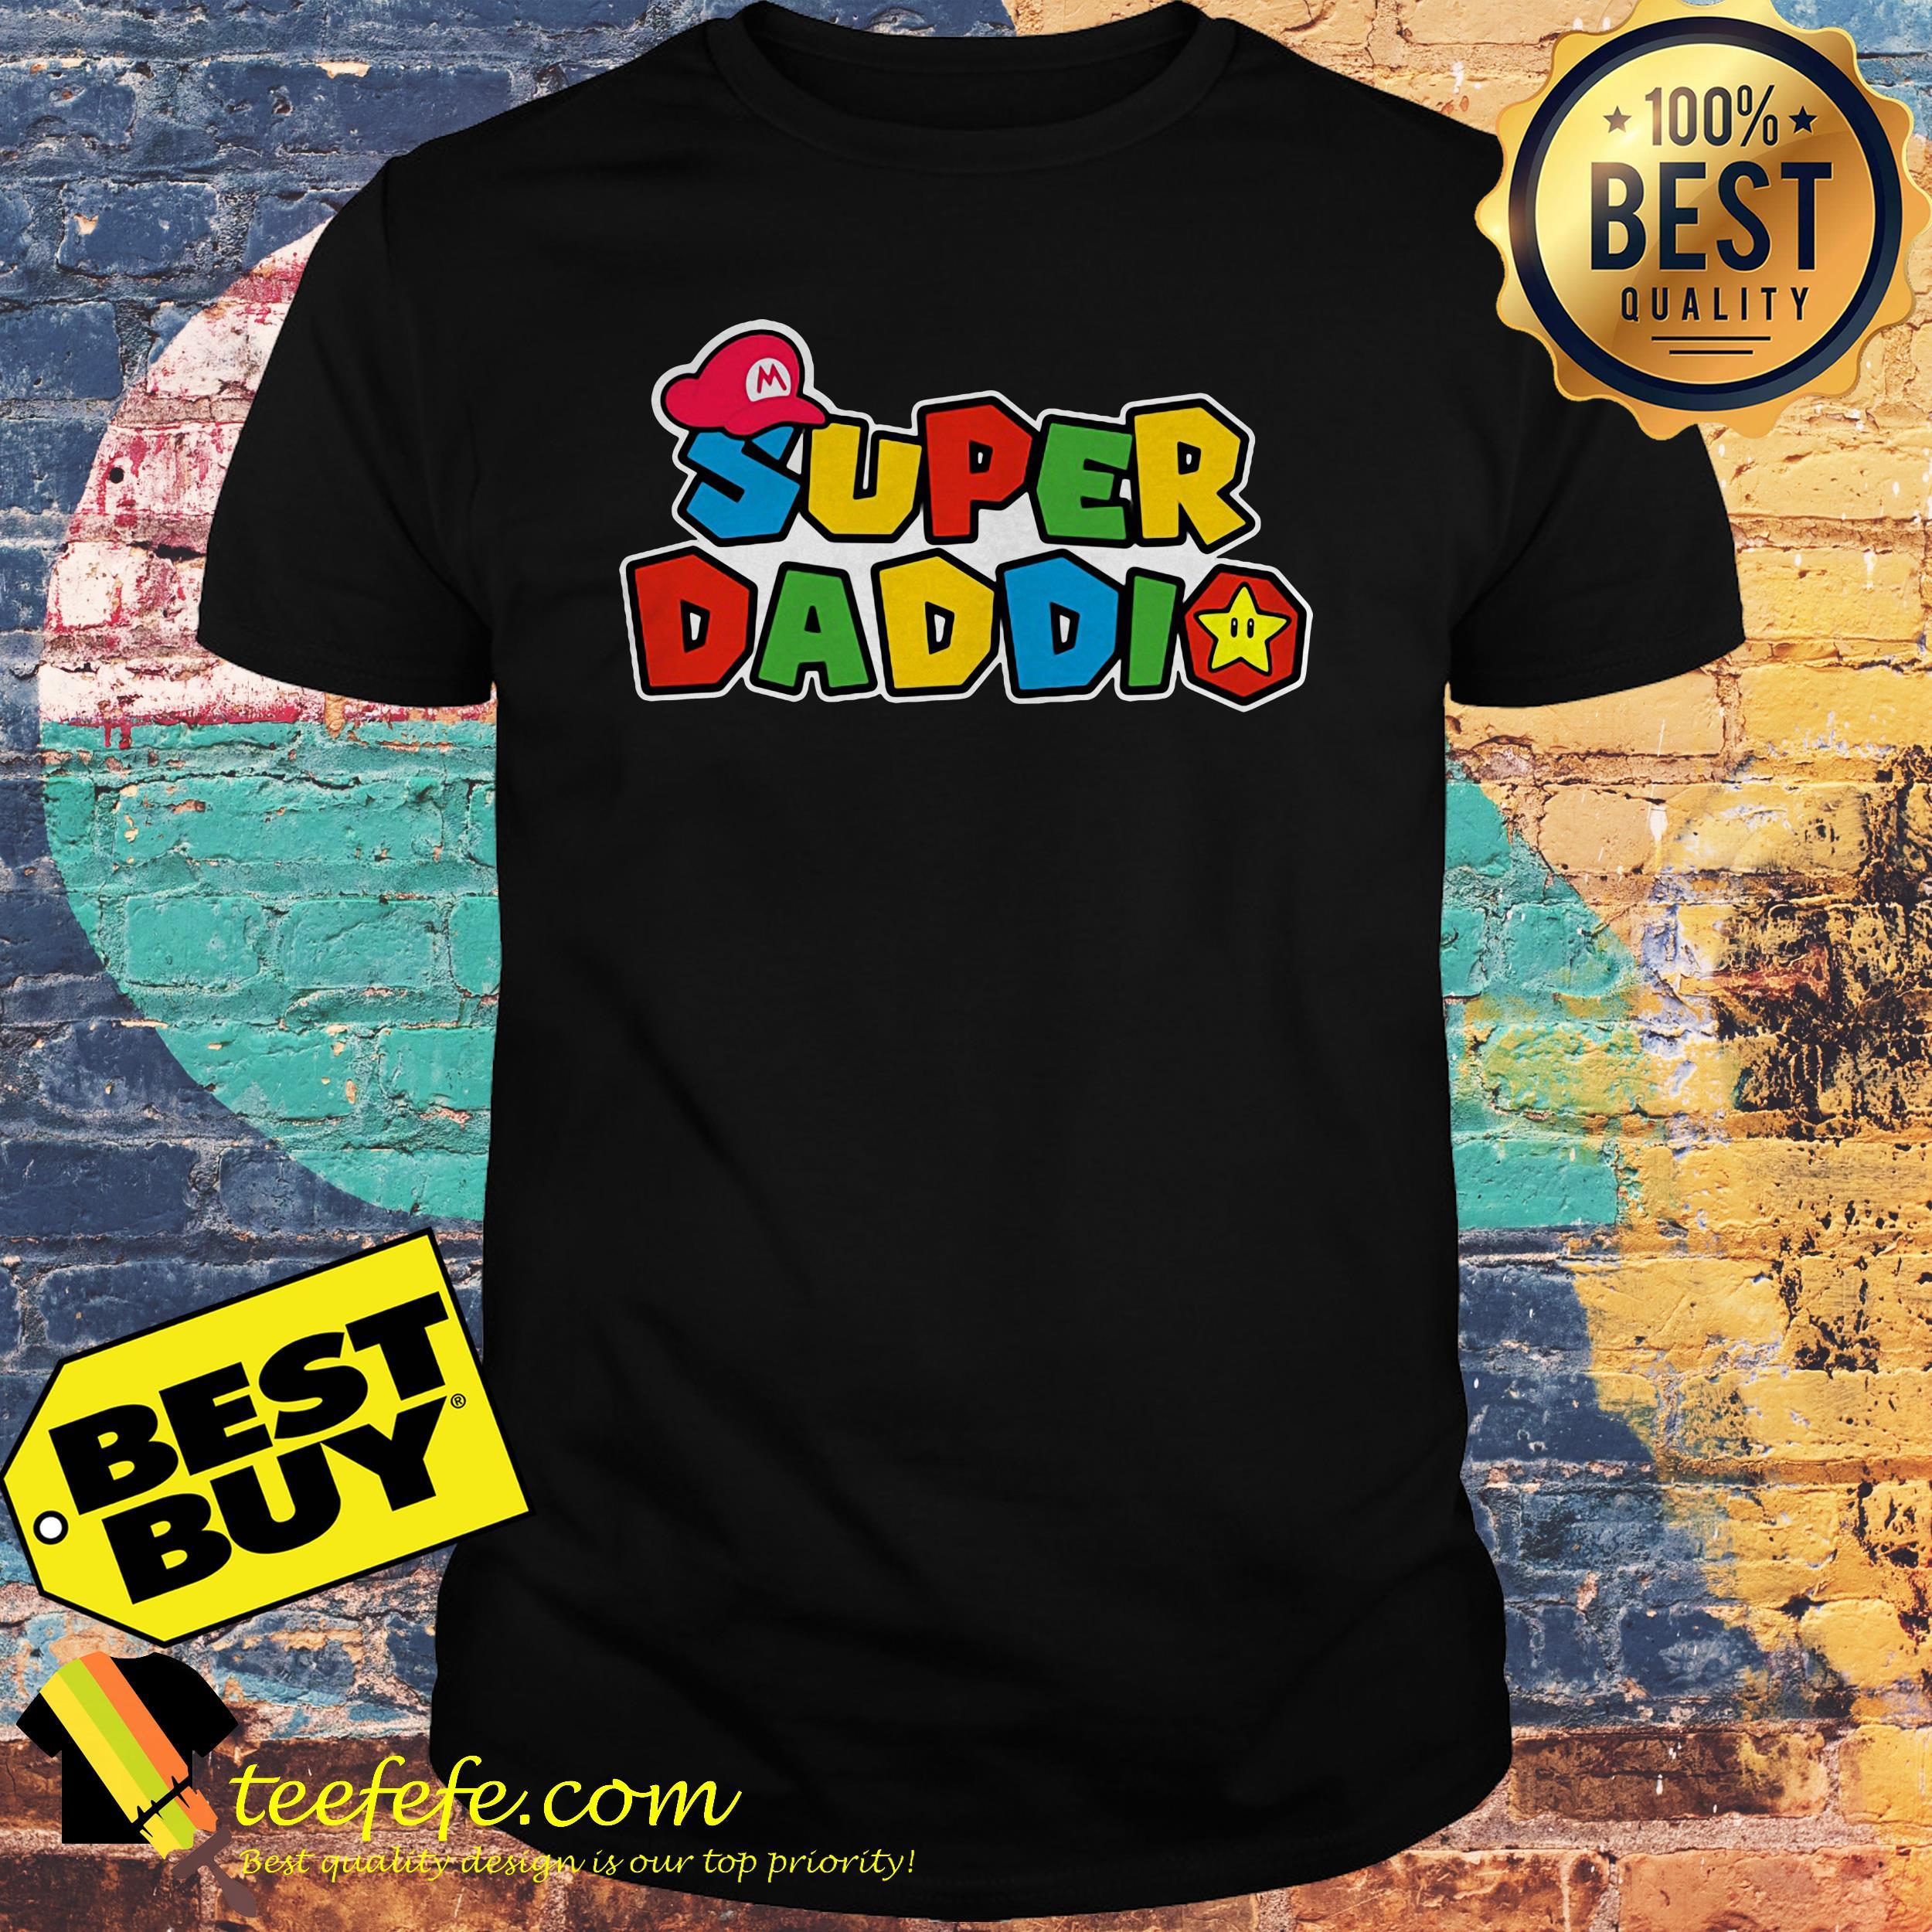 Super Daddio Super Mario Shirt